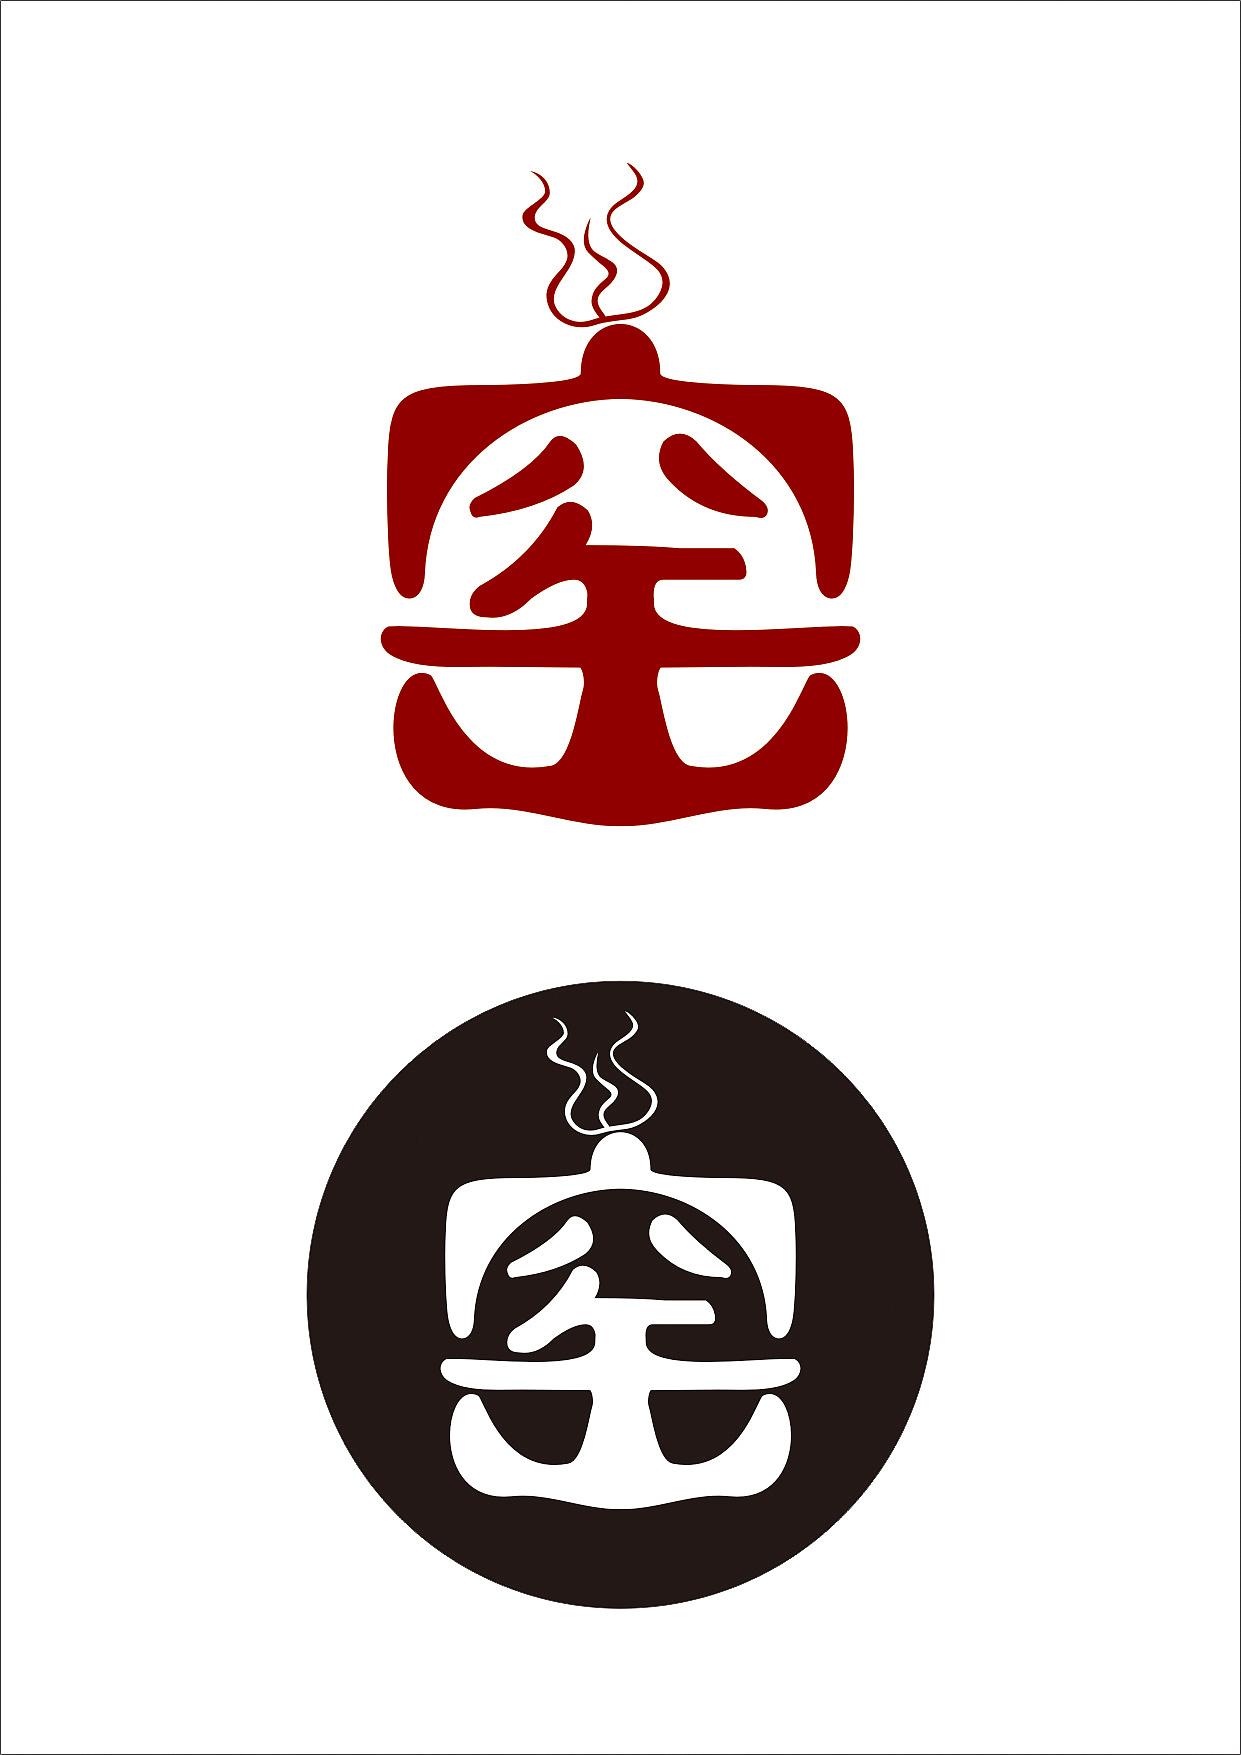 串串logo